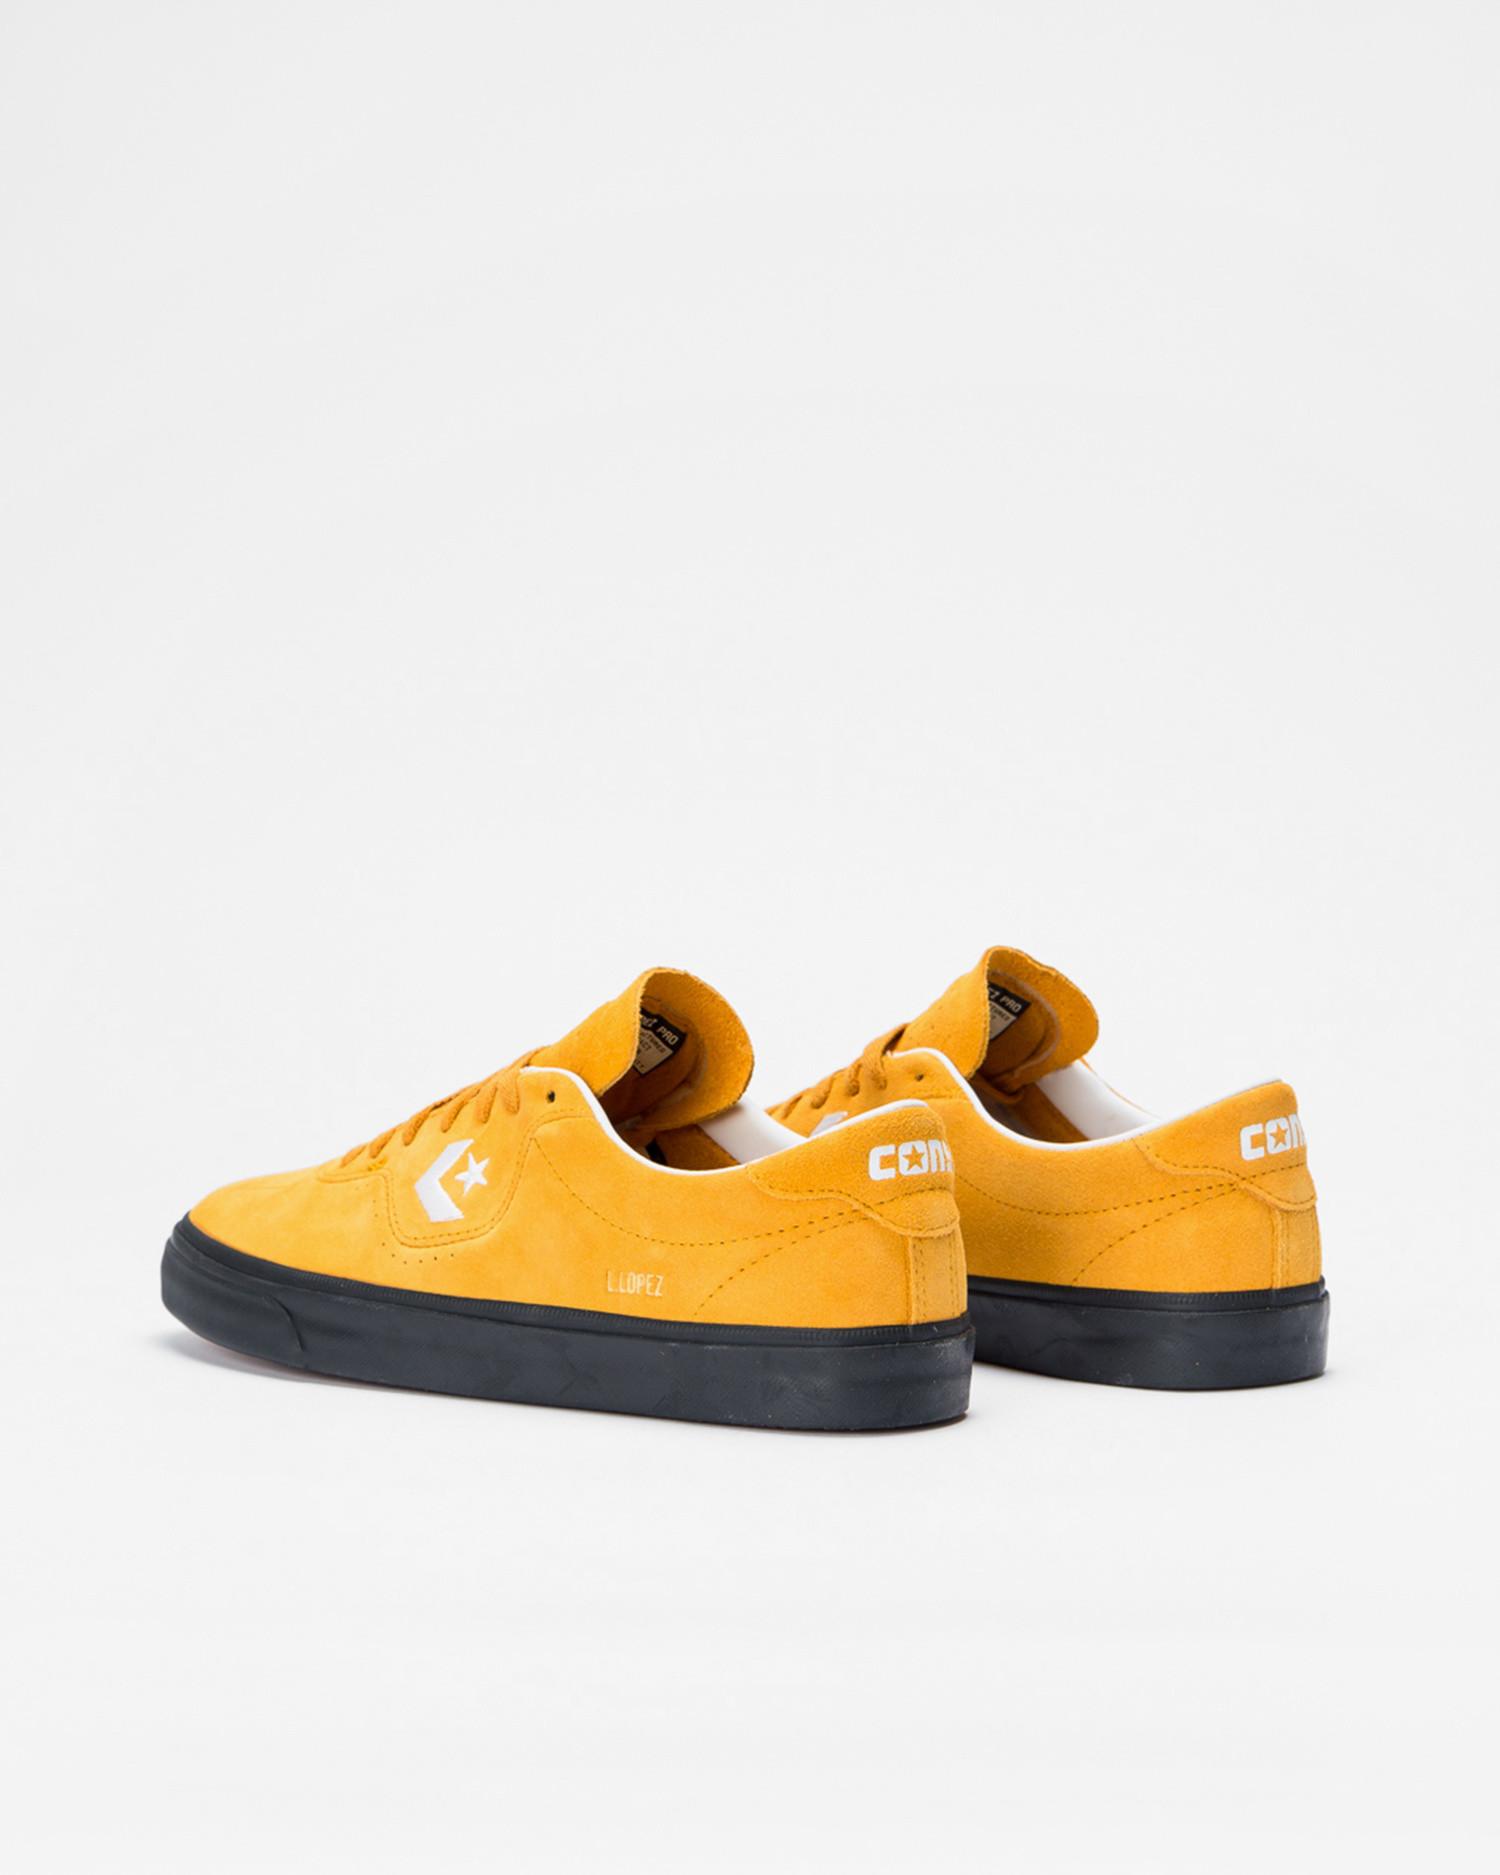 Converse Louie Lopez Pro Ox Saffron Yellow/White